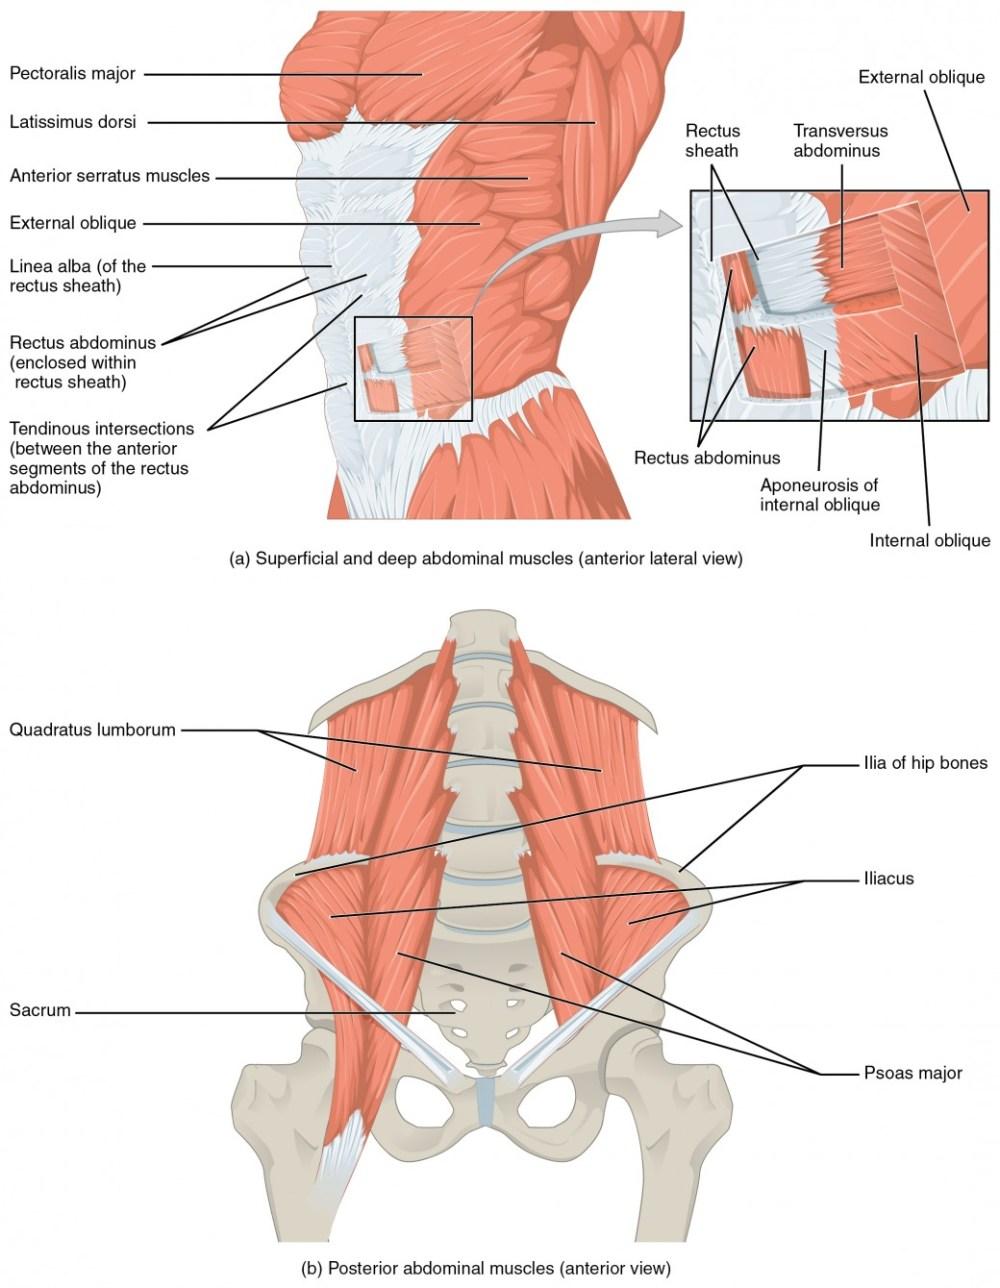 medium resolution of muscles of the abdomen